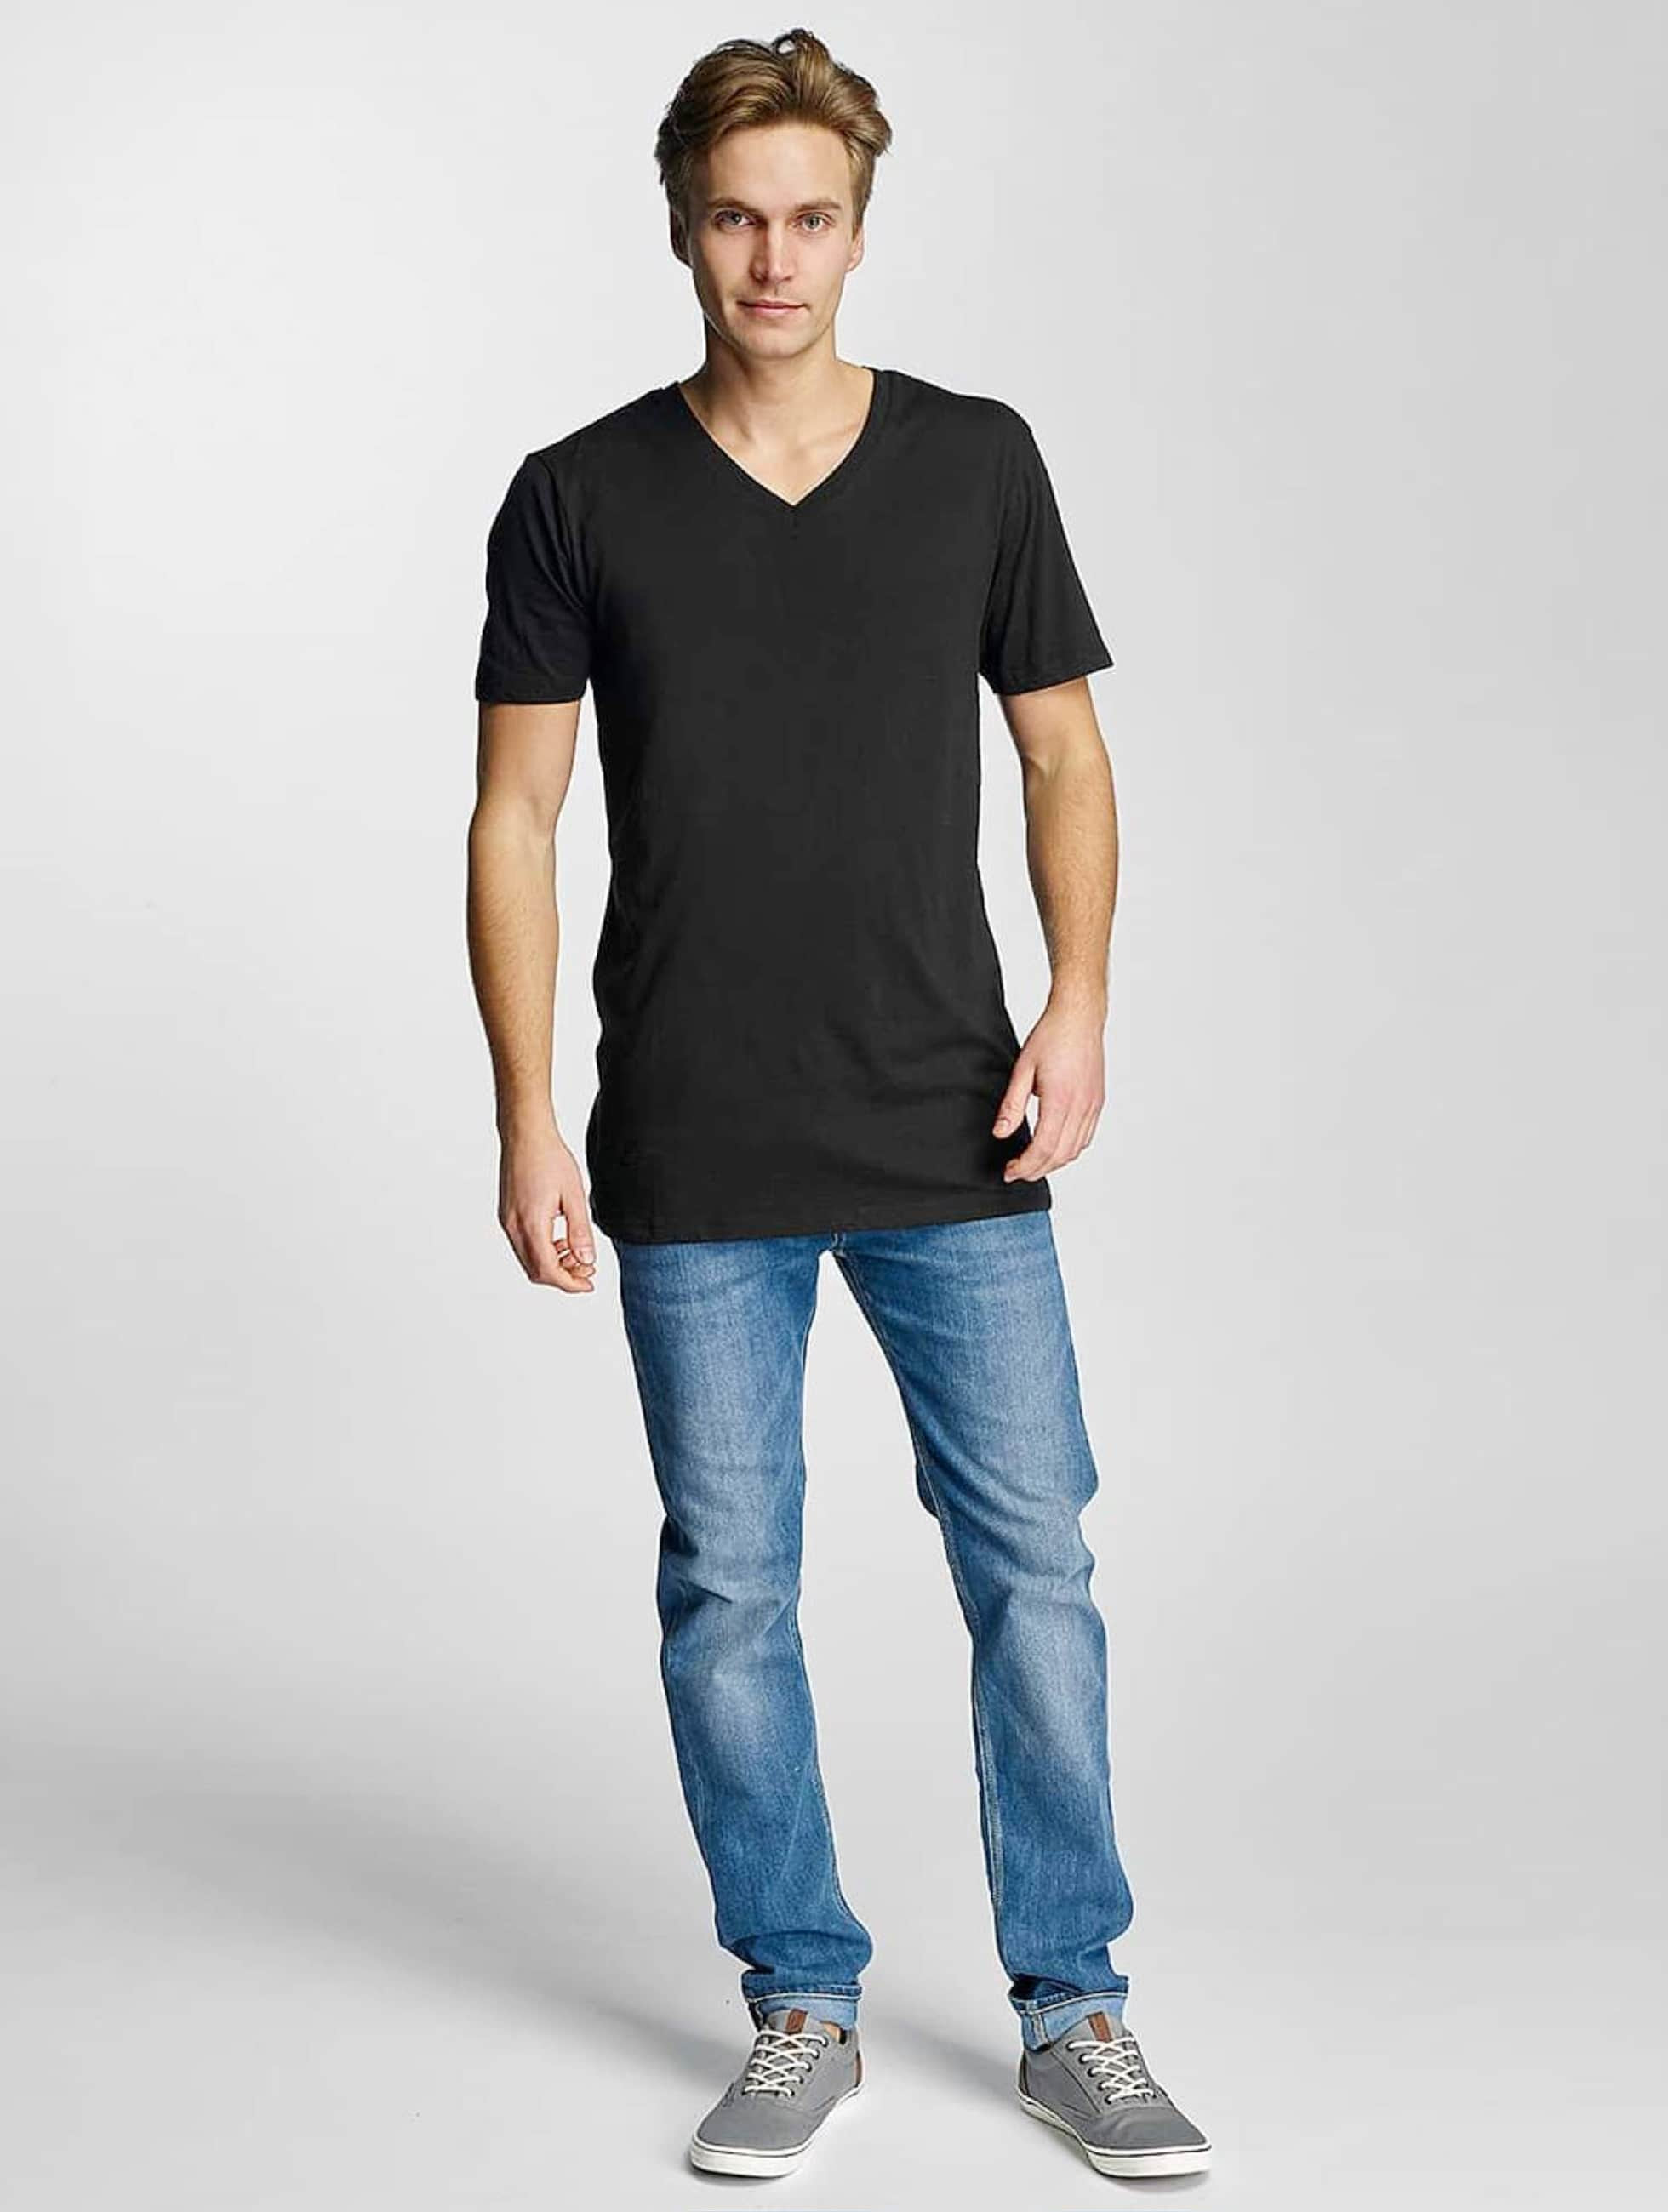 Urban Classics T-Shirt Basic V-Neck black